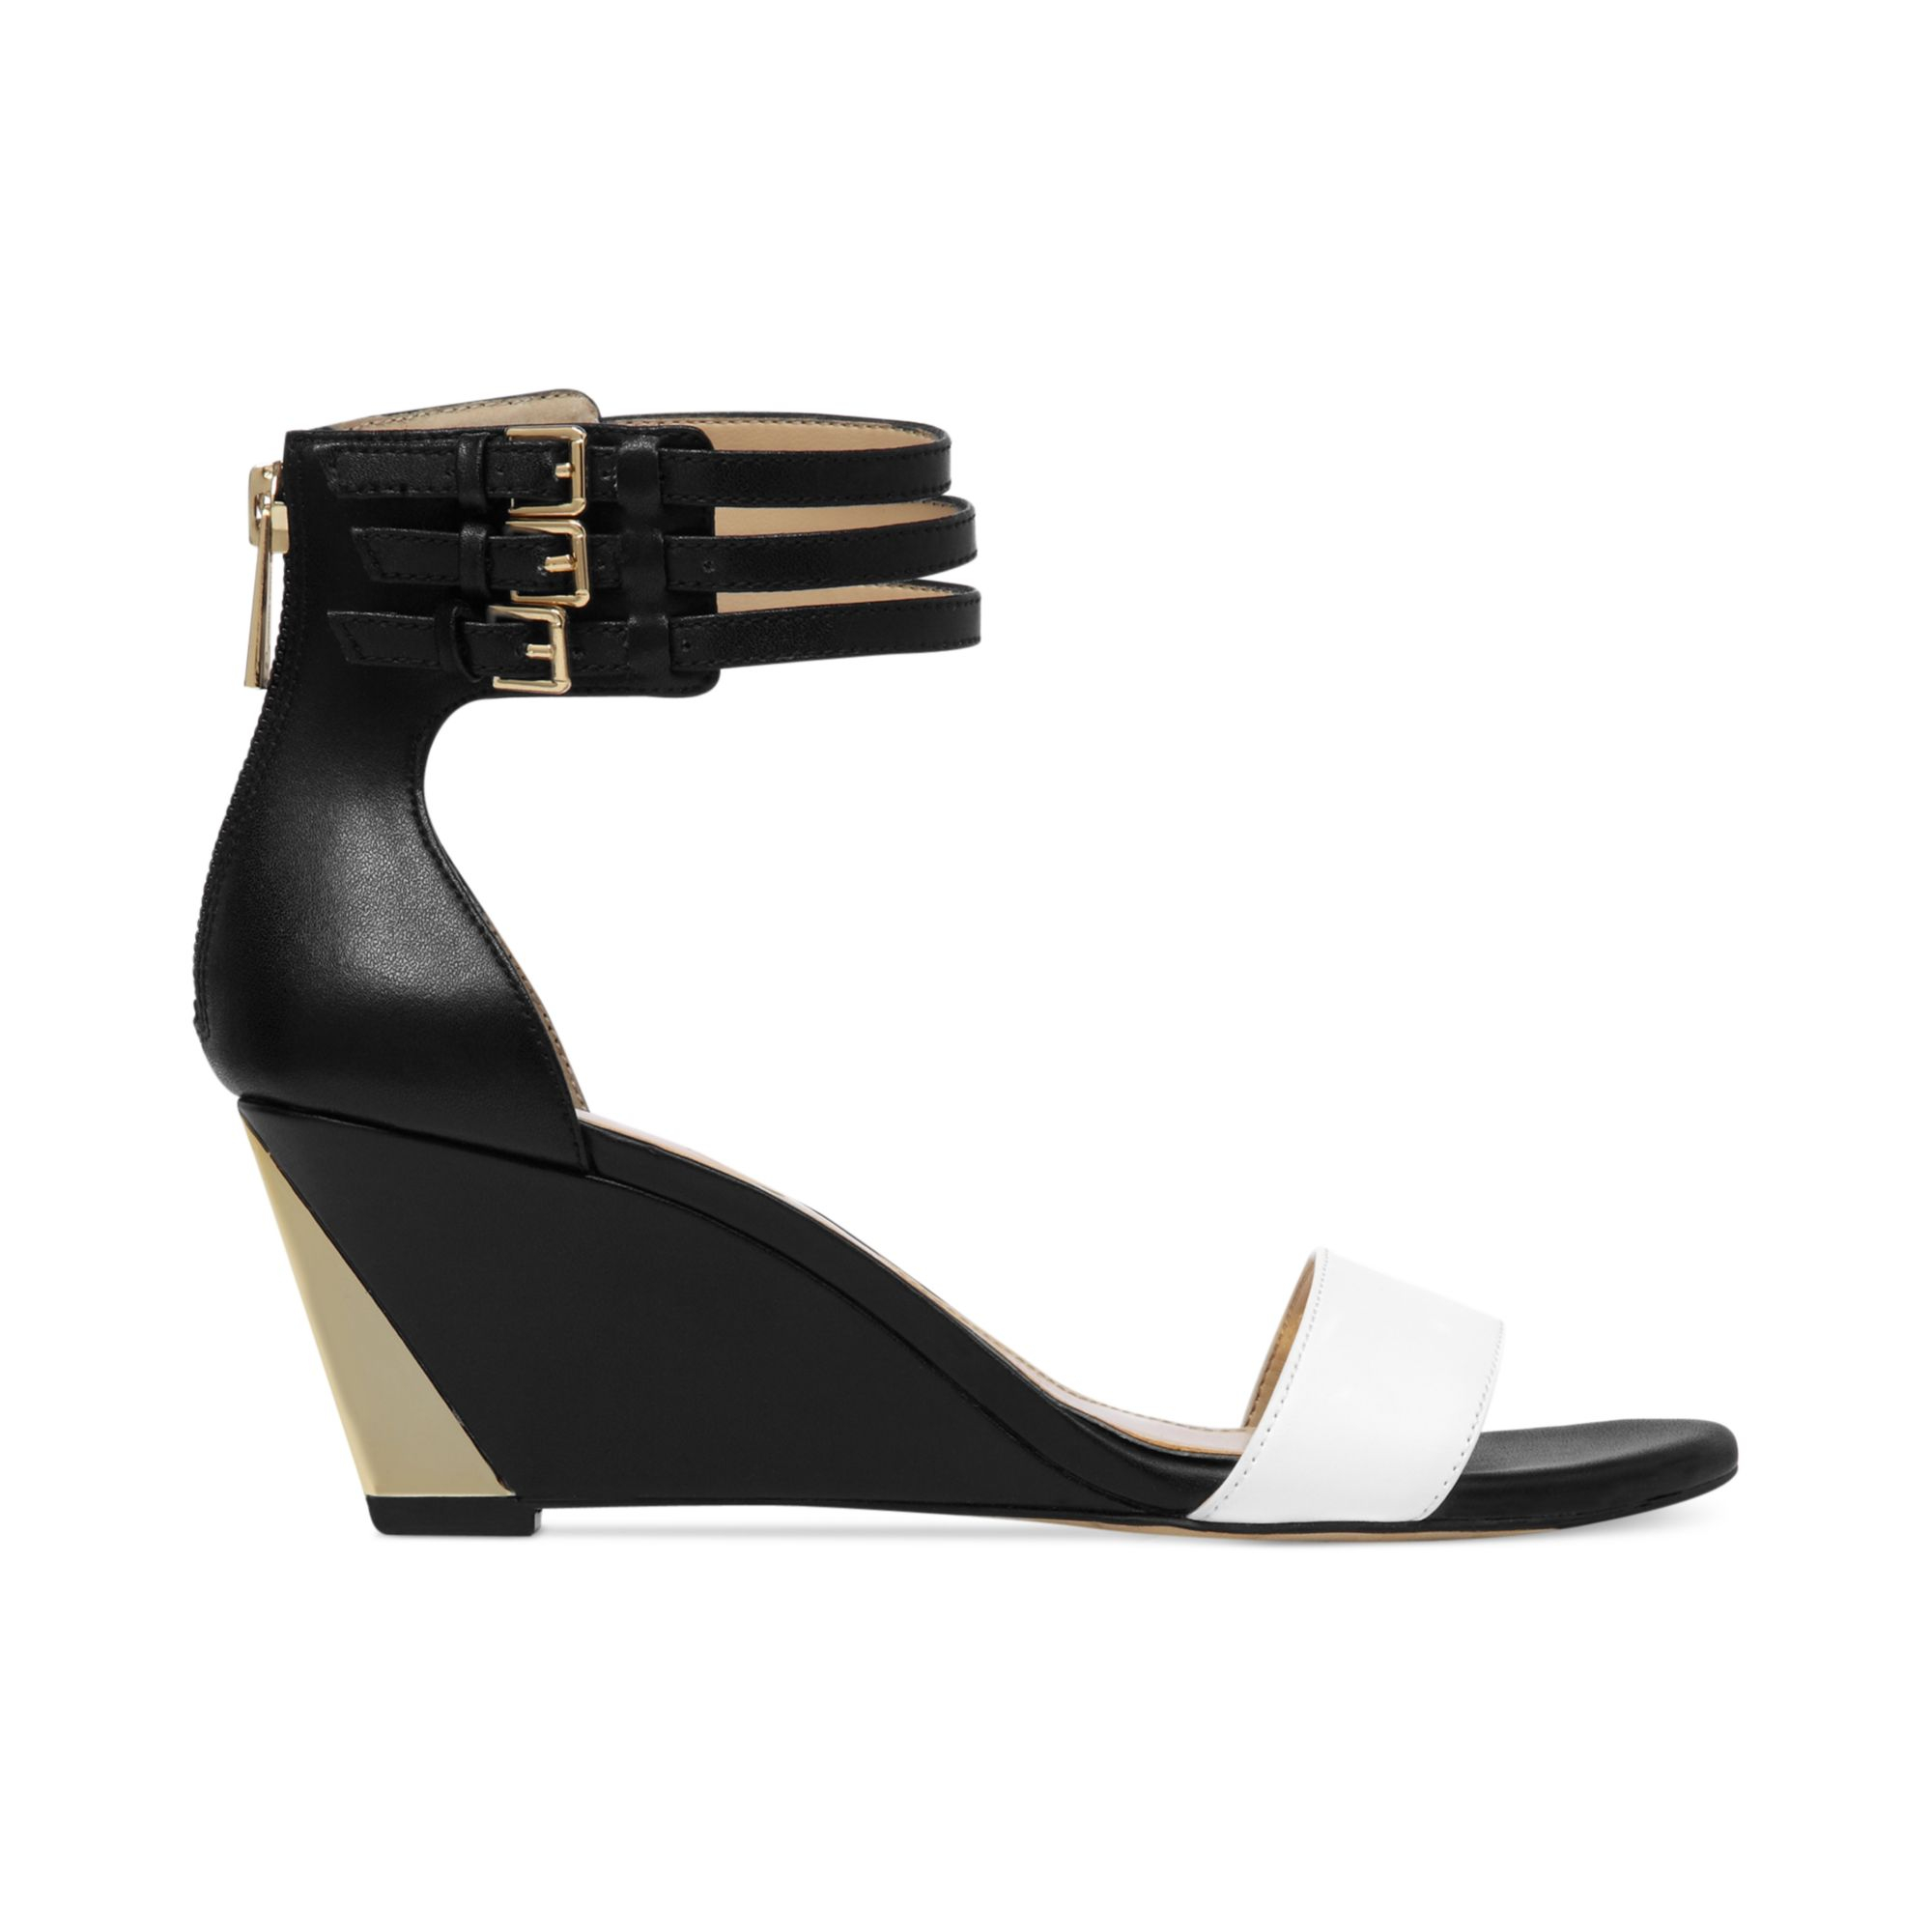 5916f6545de Lyst - Jessica Simpson Habinaa Ankle Strap Wedge Sandals in Black